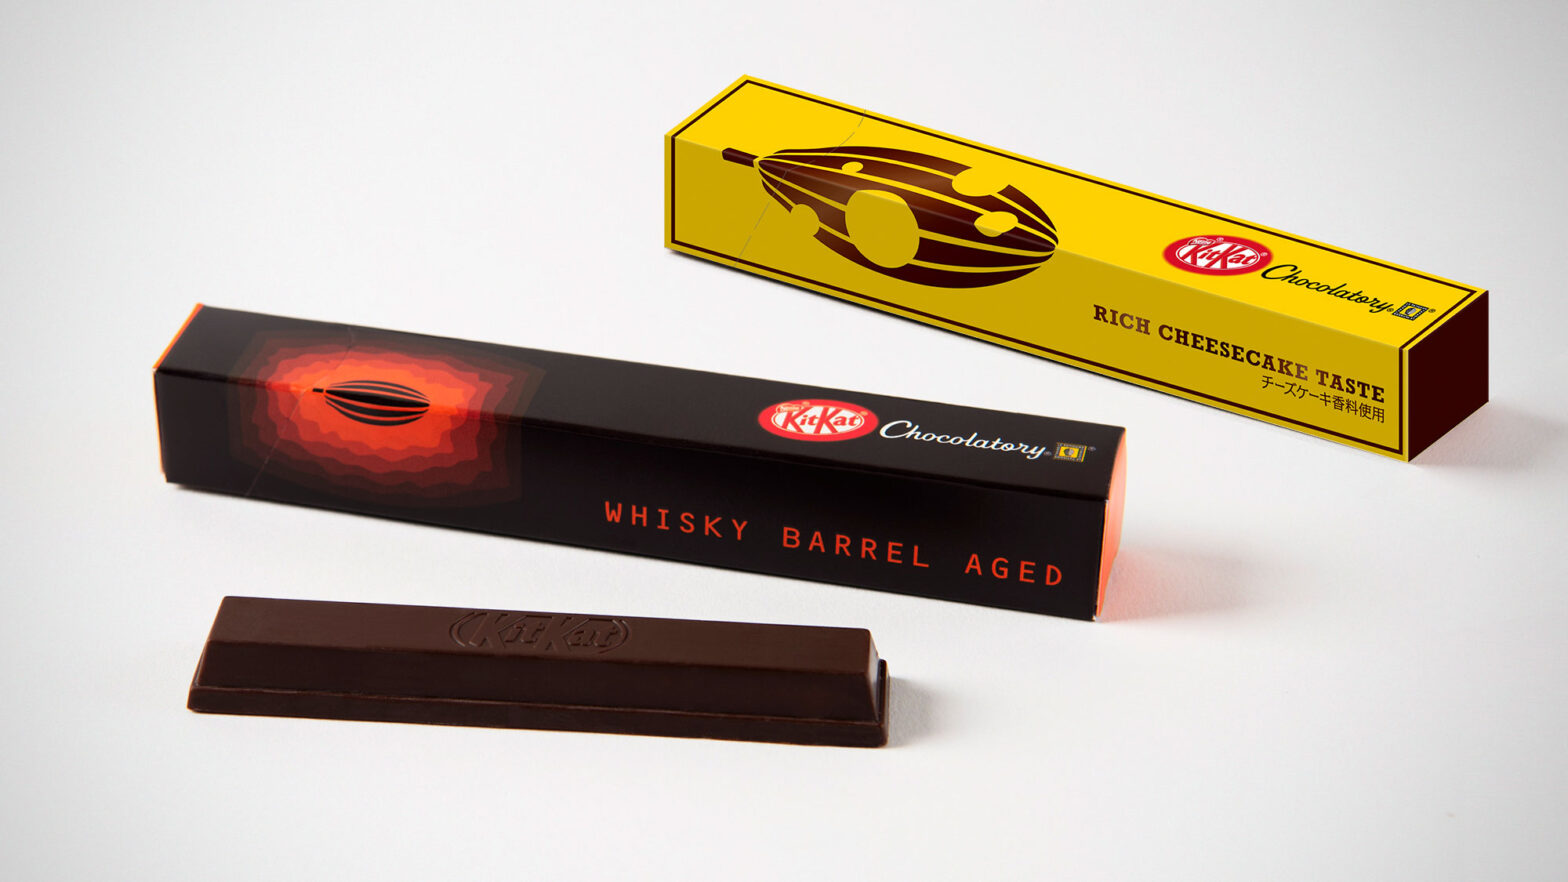 Cheesecake and Whiskey Barrel Aged KitKat